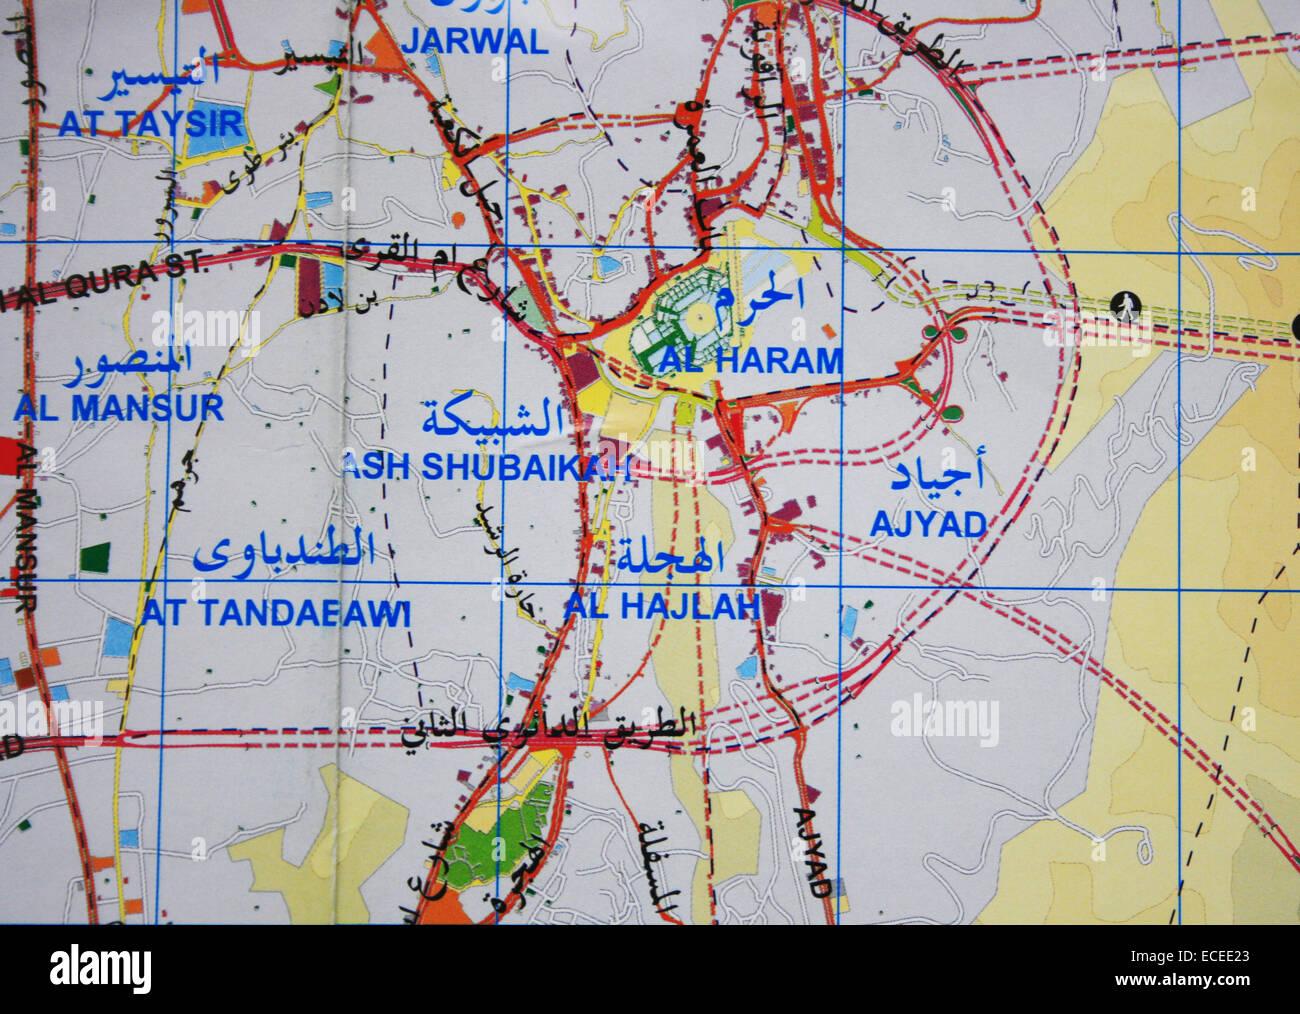 Mecca map and Masjidil Haram in Kingdom of Saudi Arabia - Stock Image